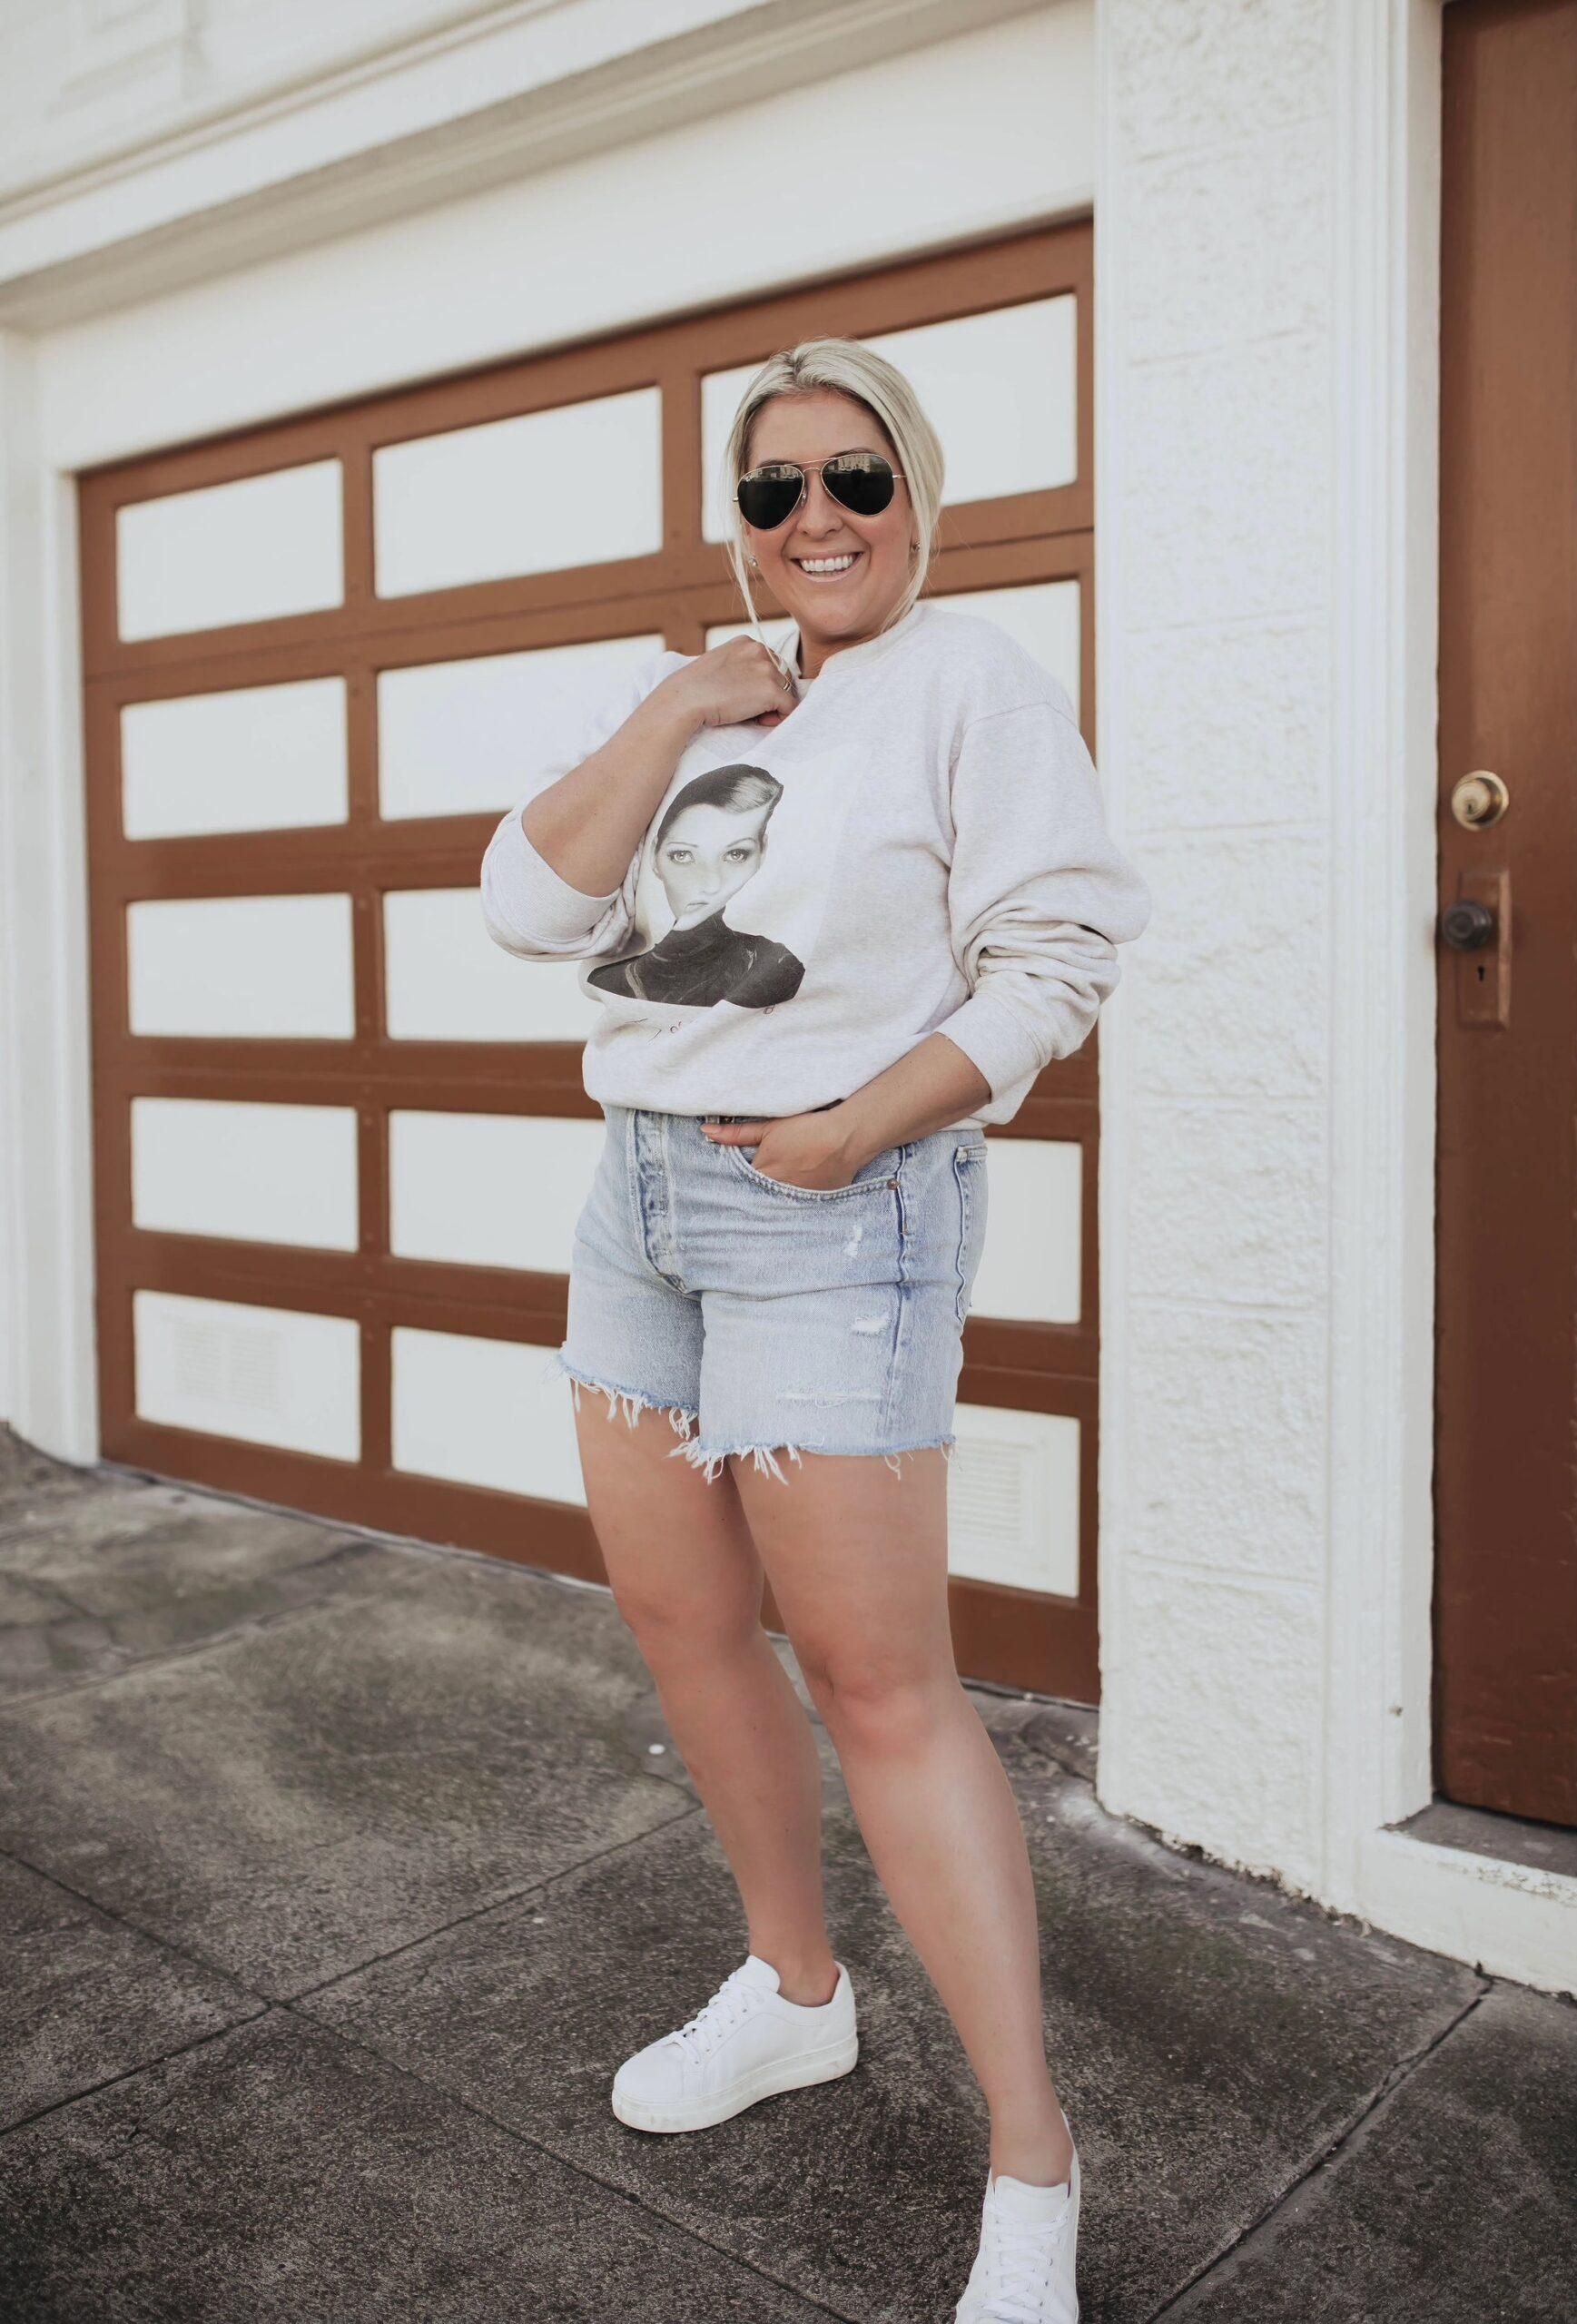 San Francisco fashion blogger KatWalkSF wears the Long Agolde Parker Shorts with an Anine Bing sweatshirt.